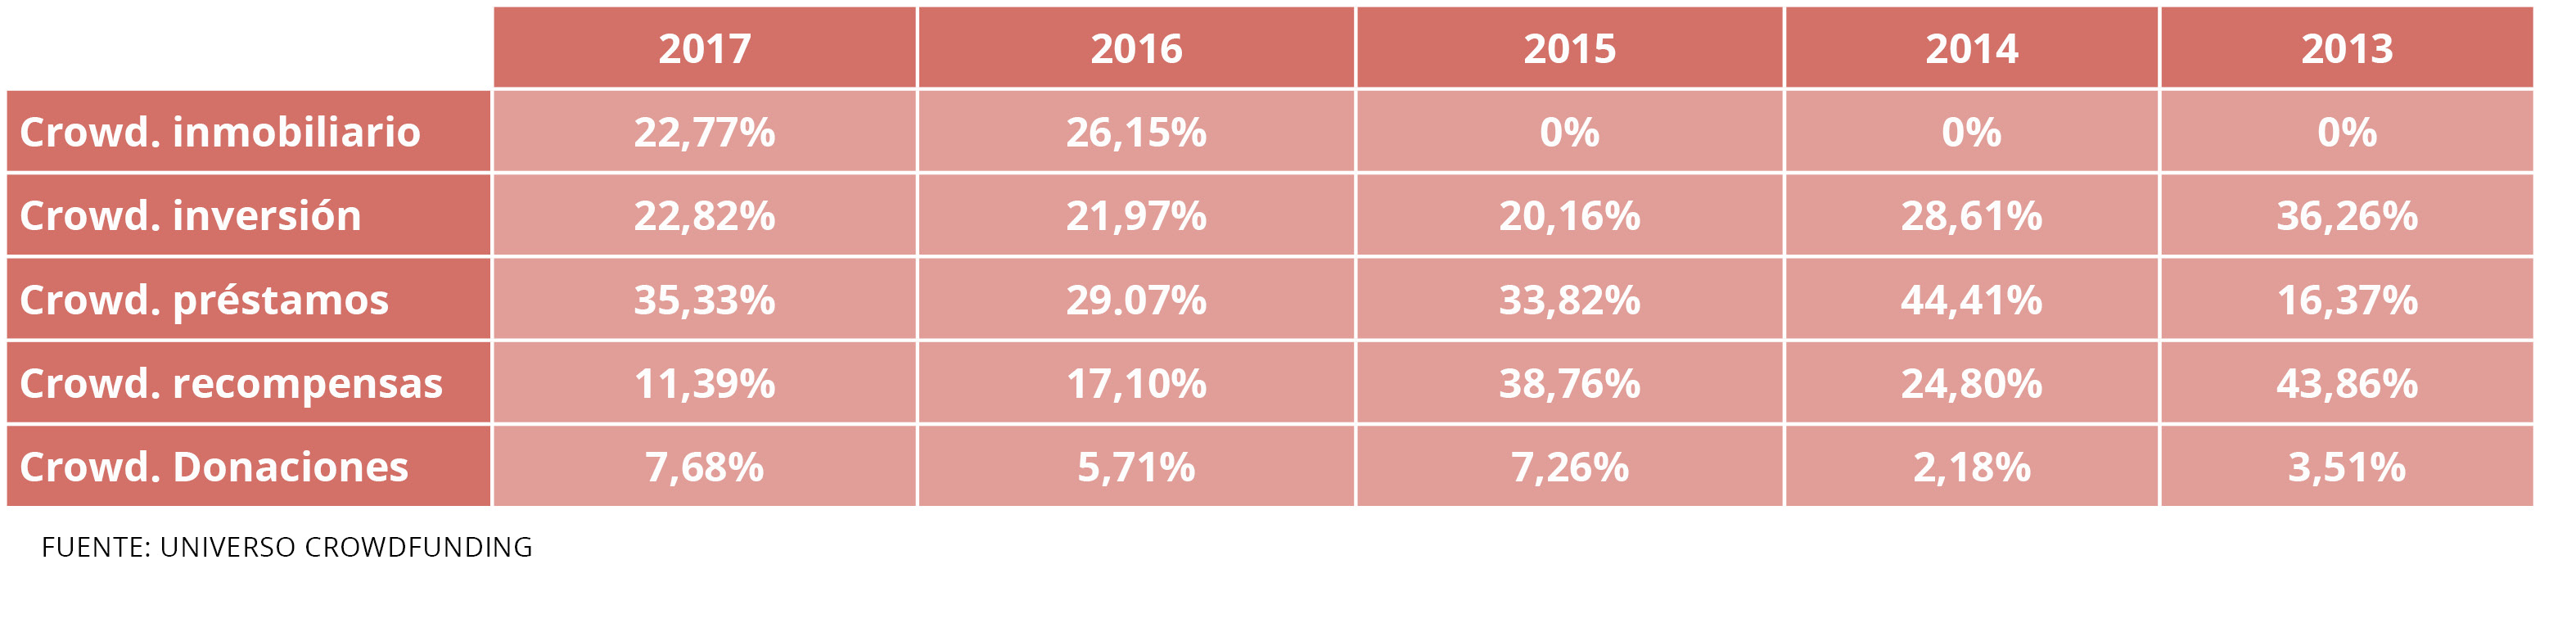 tabla distribución crowdfunding en España Housers